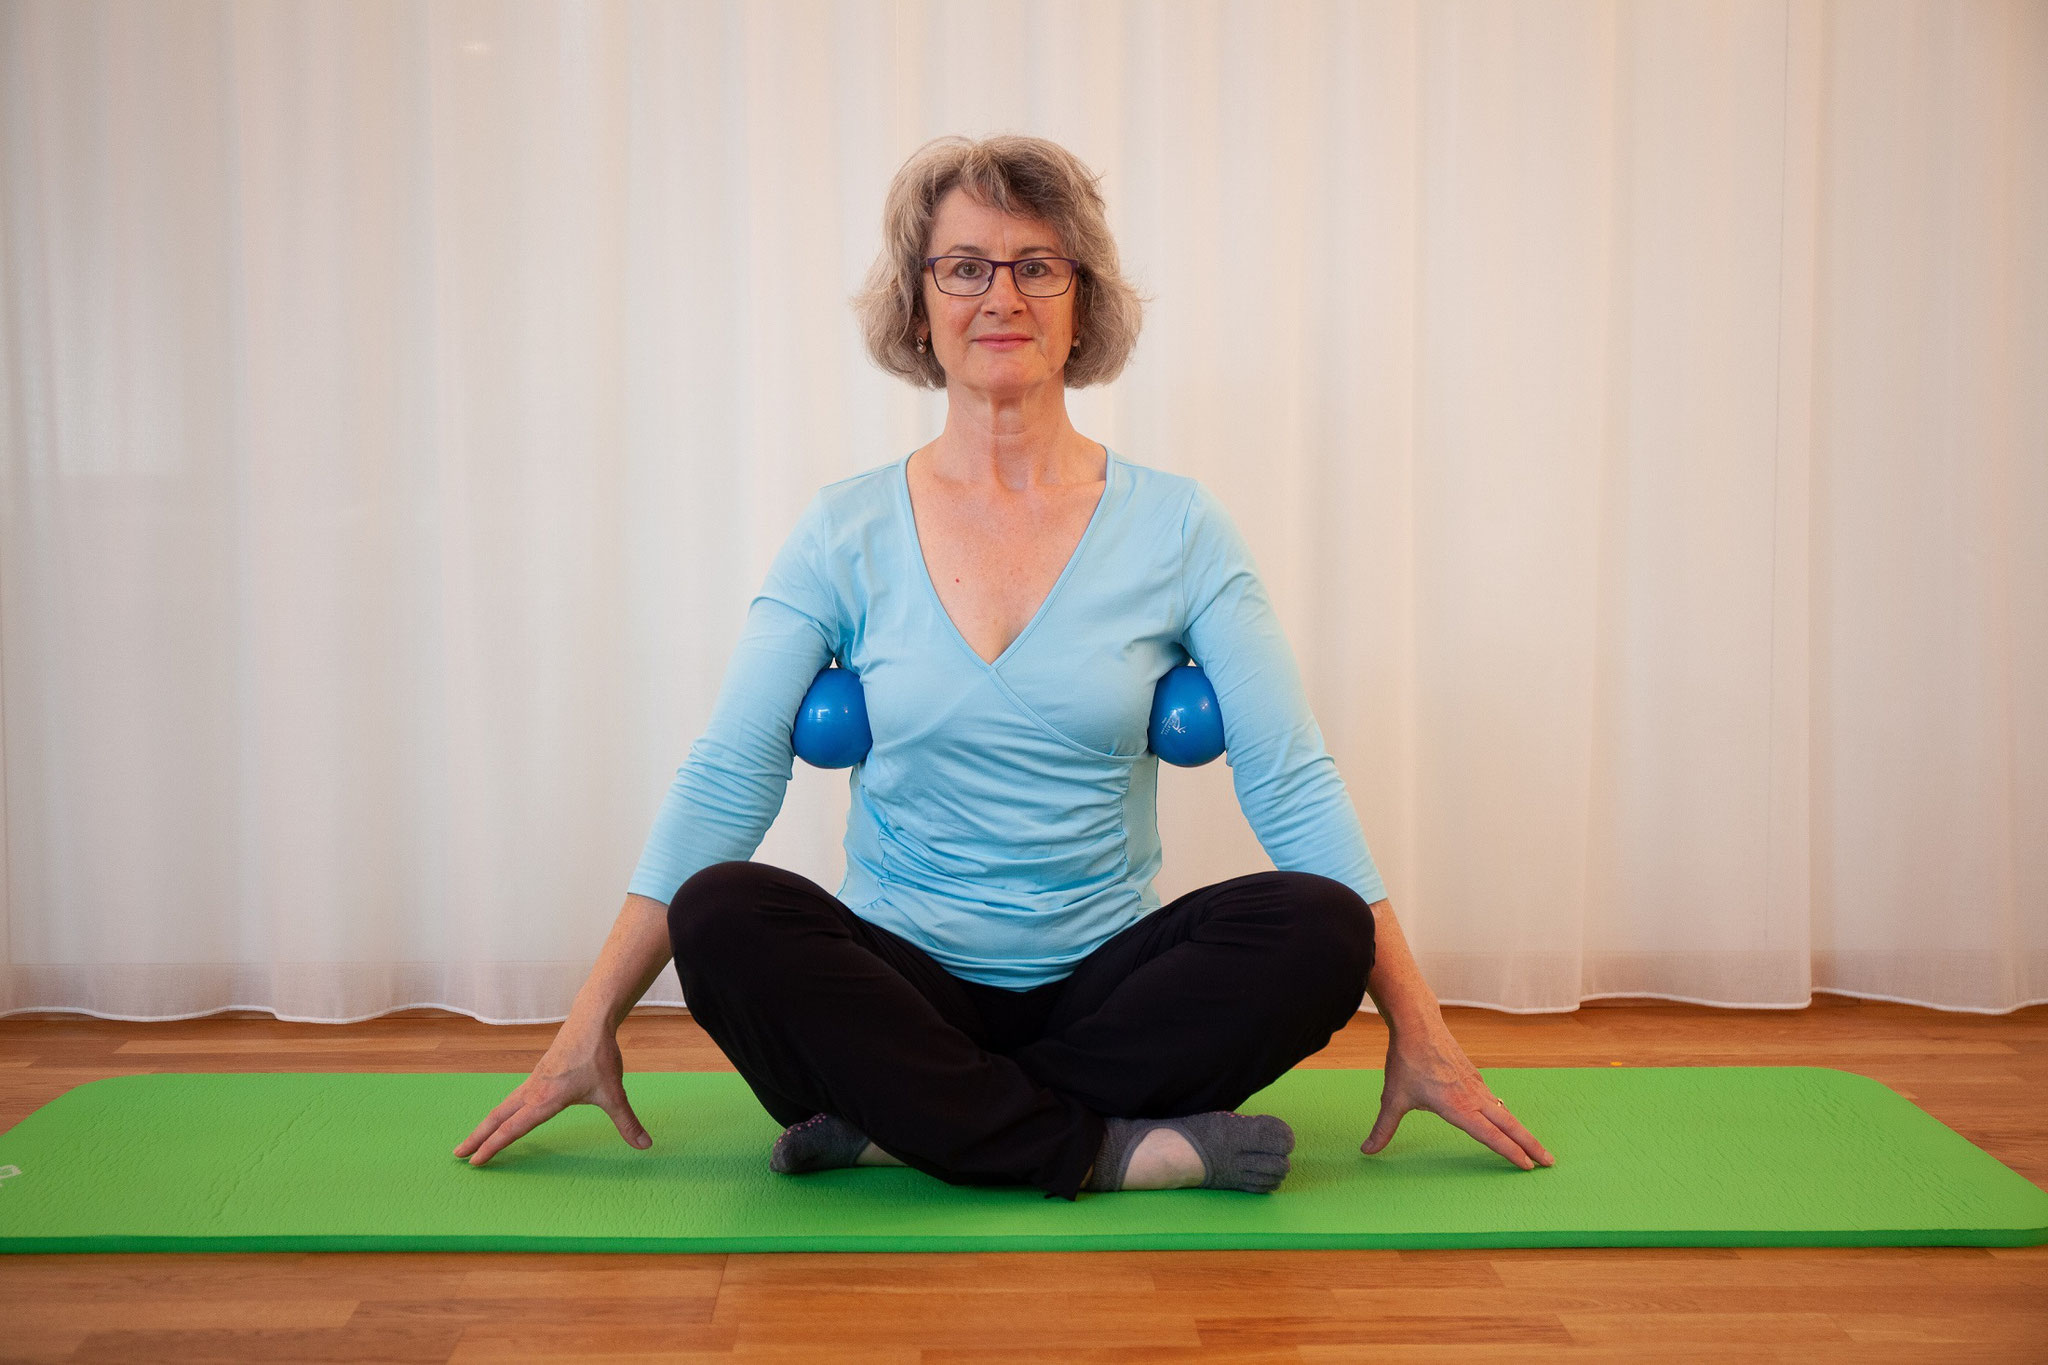 Pilates-Atmung mit Hilfe der Toningbälle